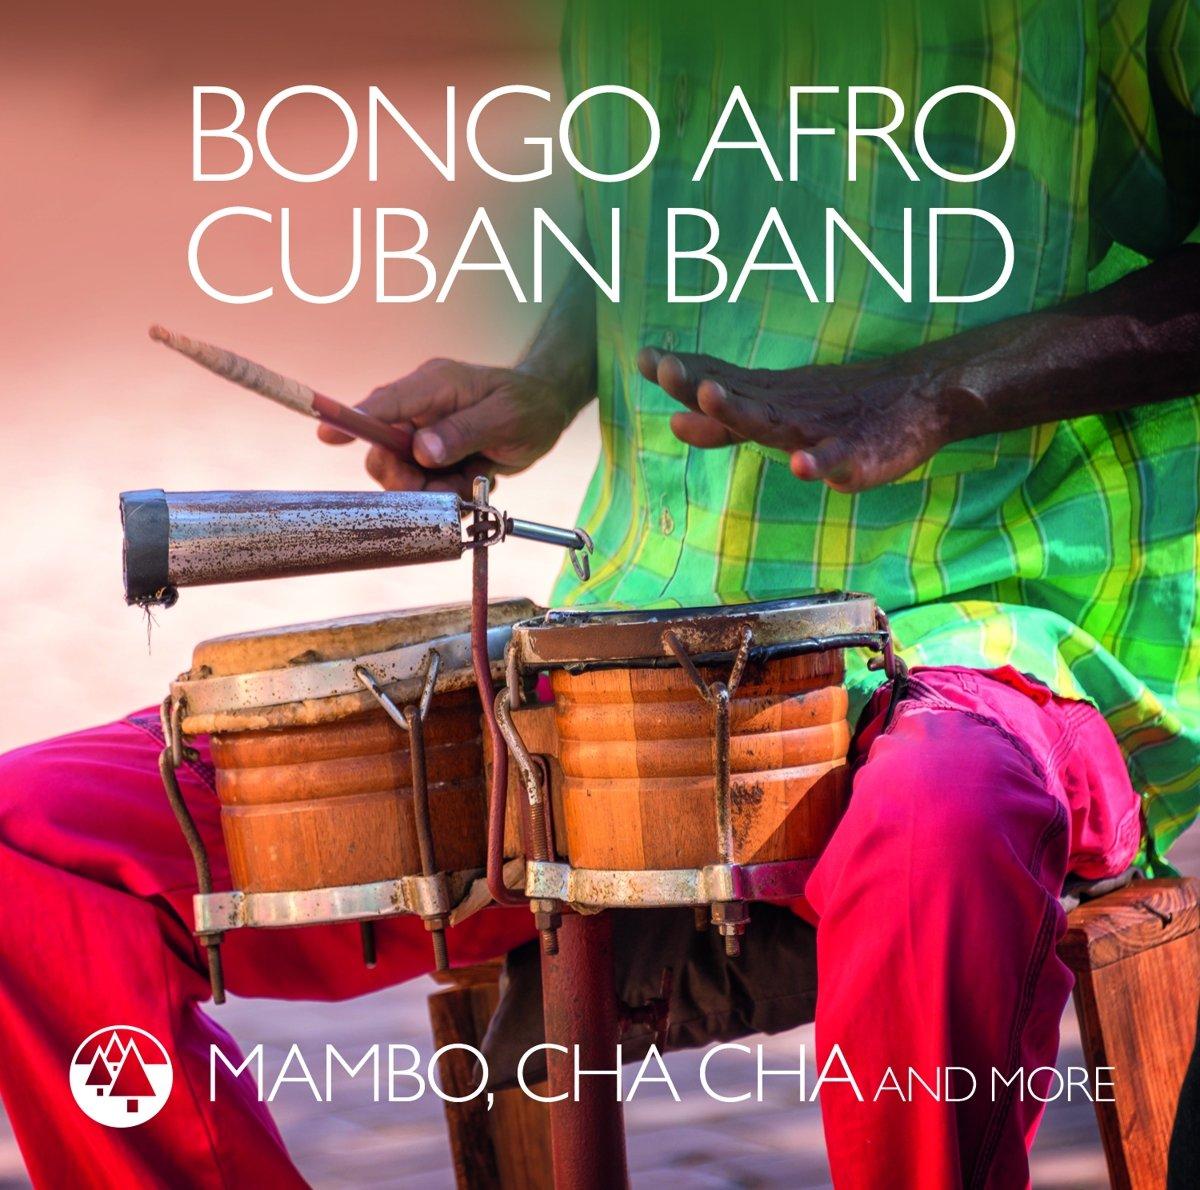 Bongo Afro Cuban Band Bongo Afro Cuban Band. Mambo, Cha Cha And More wade mary hazelton blanchard our little cuban cousin